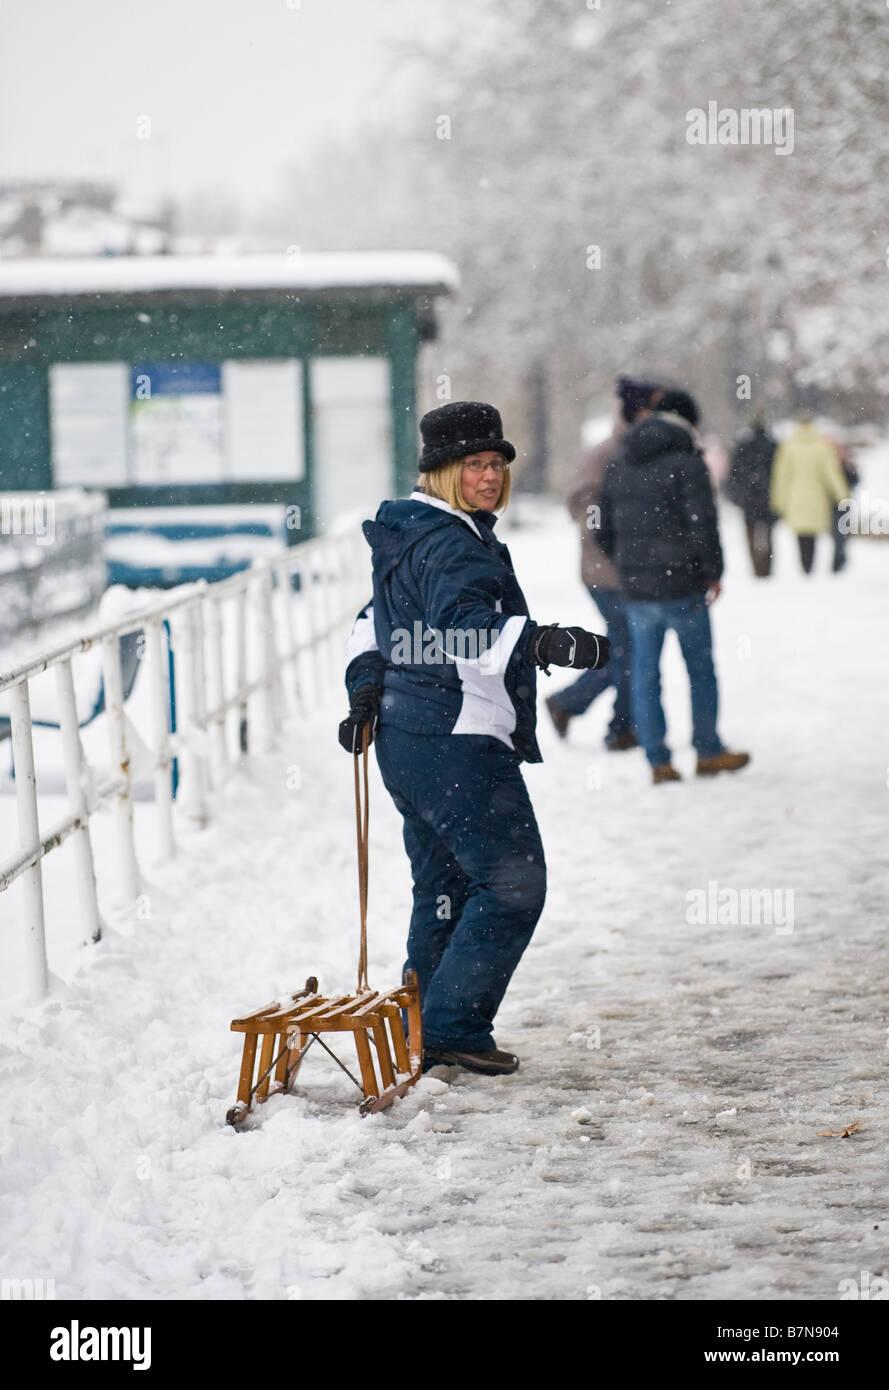 Woman pulling a wooden sledge, Richmond, London, UK - Stock Image